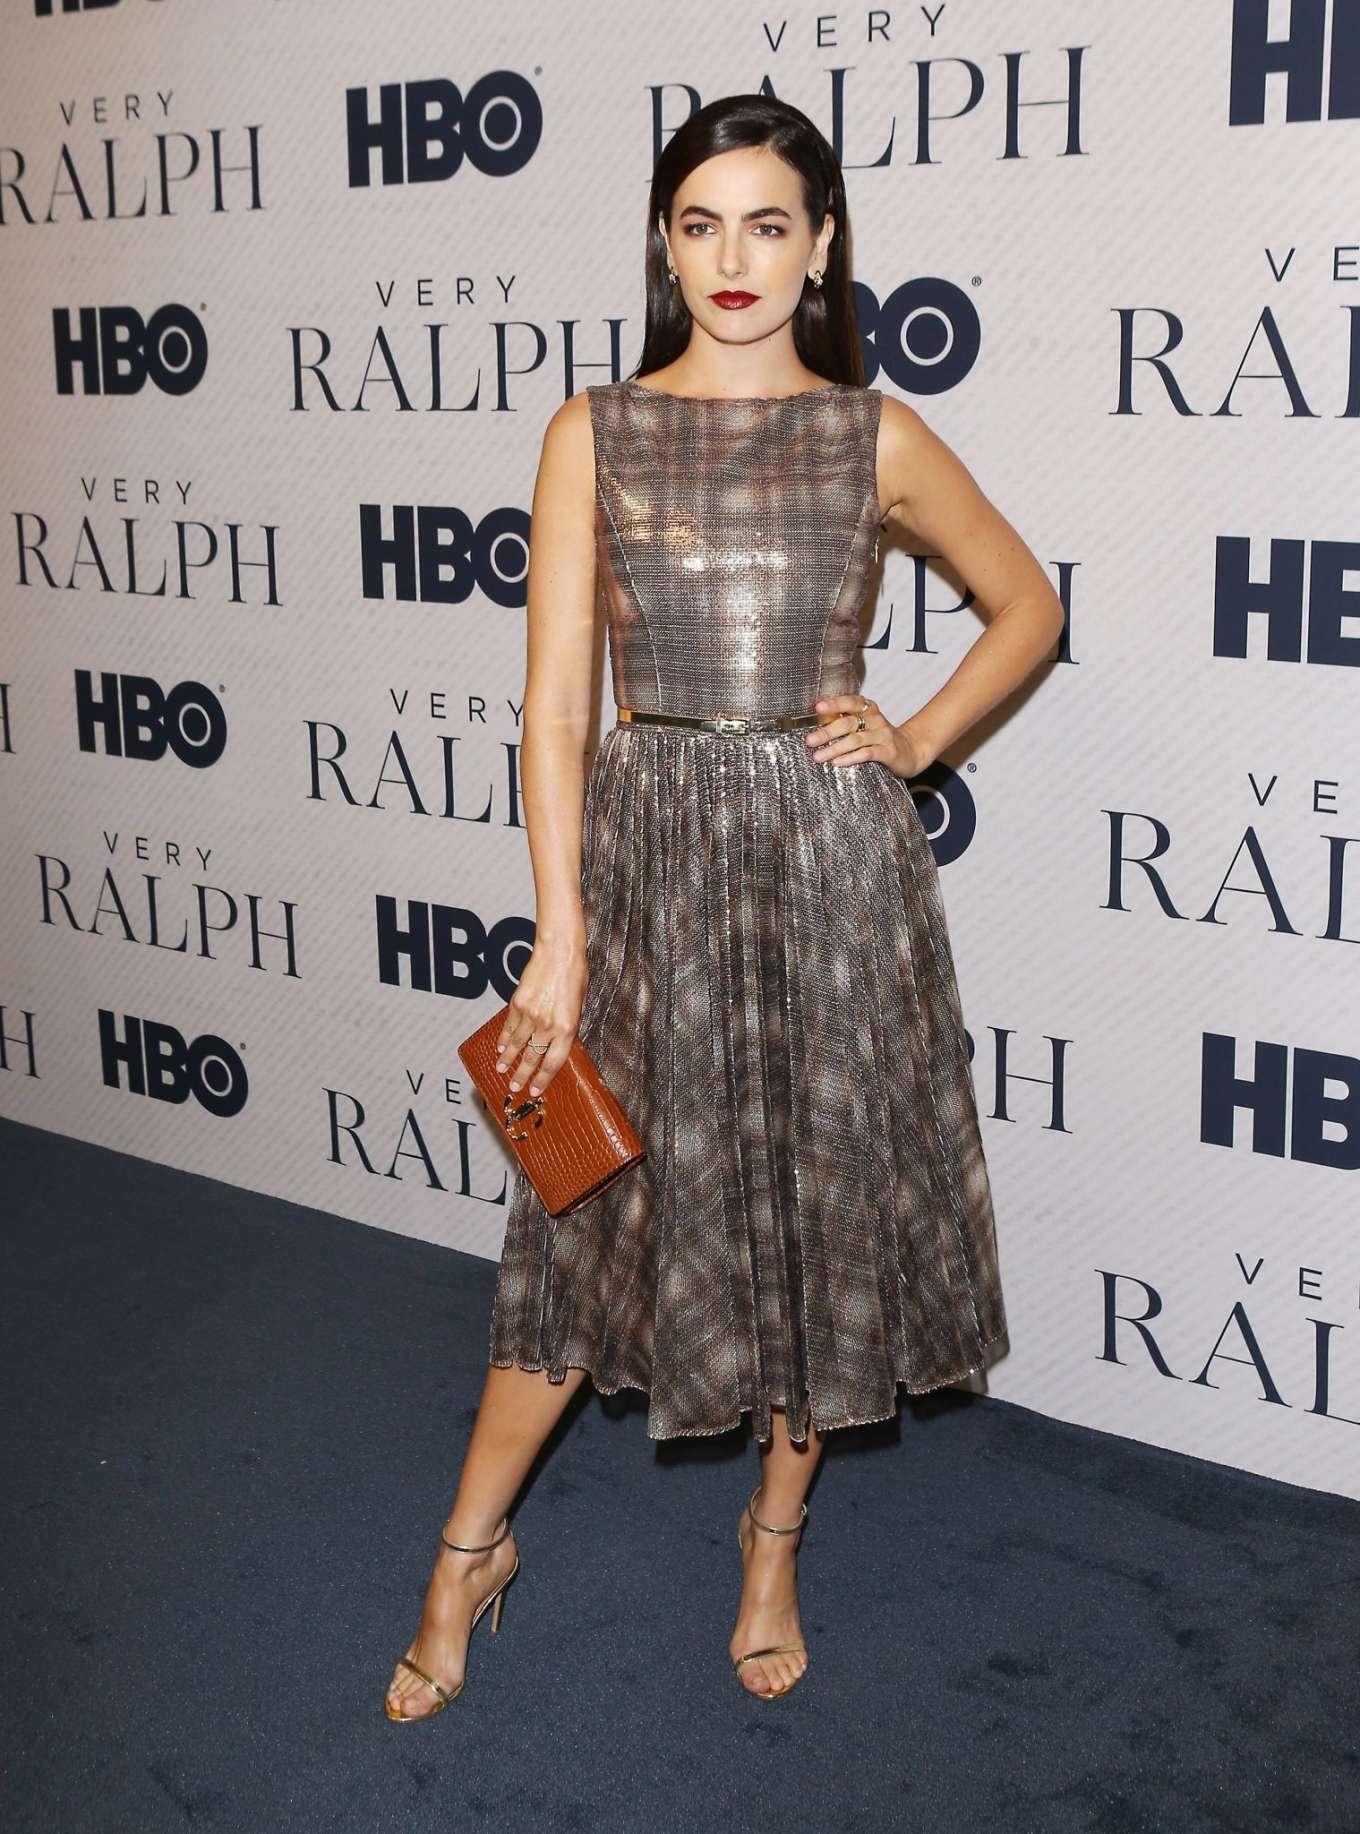 Camilla Belle 2019 : Camilla Belle – Very Ralph Premiere in Beverly Hills-19